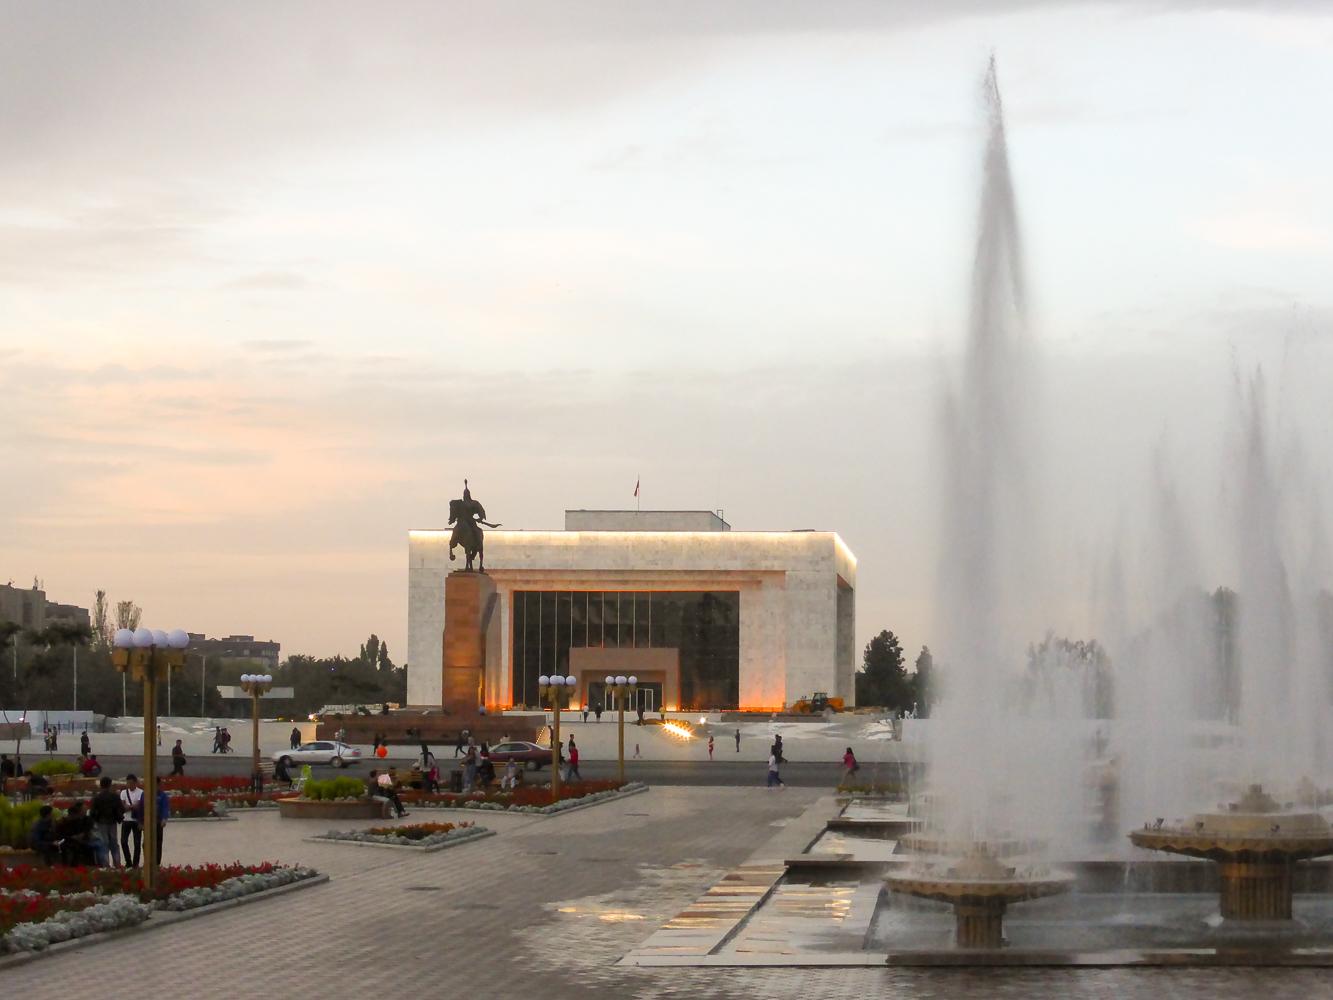 Kyrgyzstan's capital Bishkek